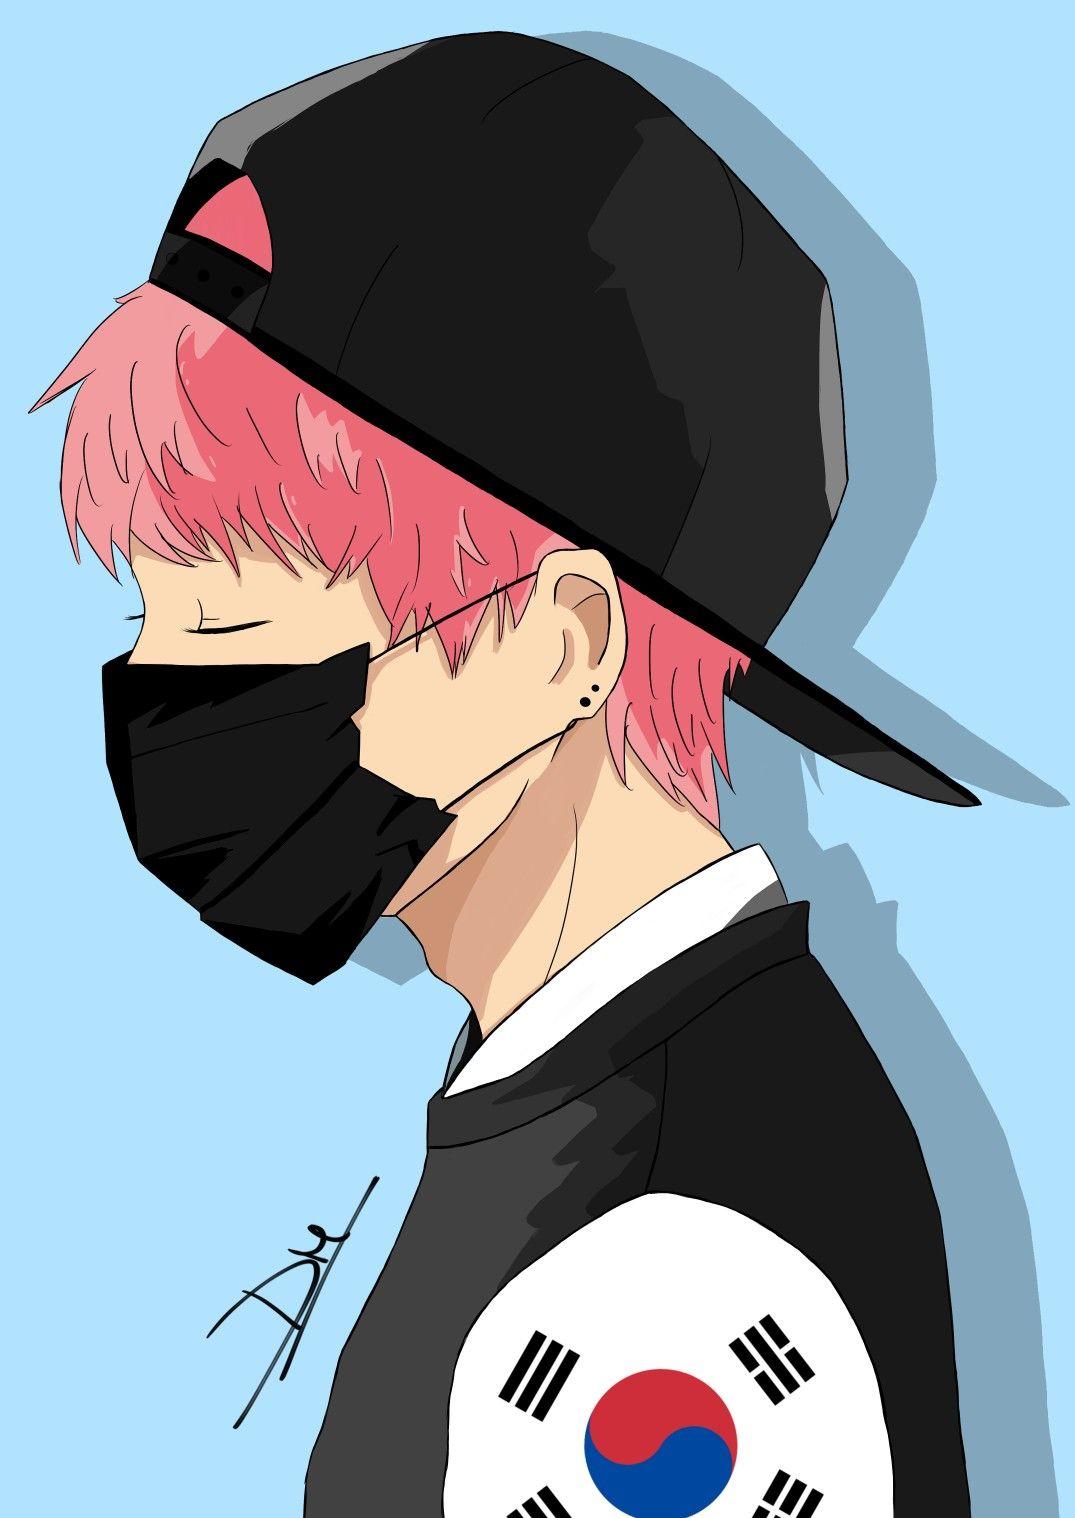 K Pop Idol Bts Got7 Seventeen Pentagon Monstax Straykids Exo Nct Cbx Bigbang K Pop Idol Southkorea Draw Artist Illustration Digital Art Anime